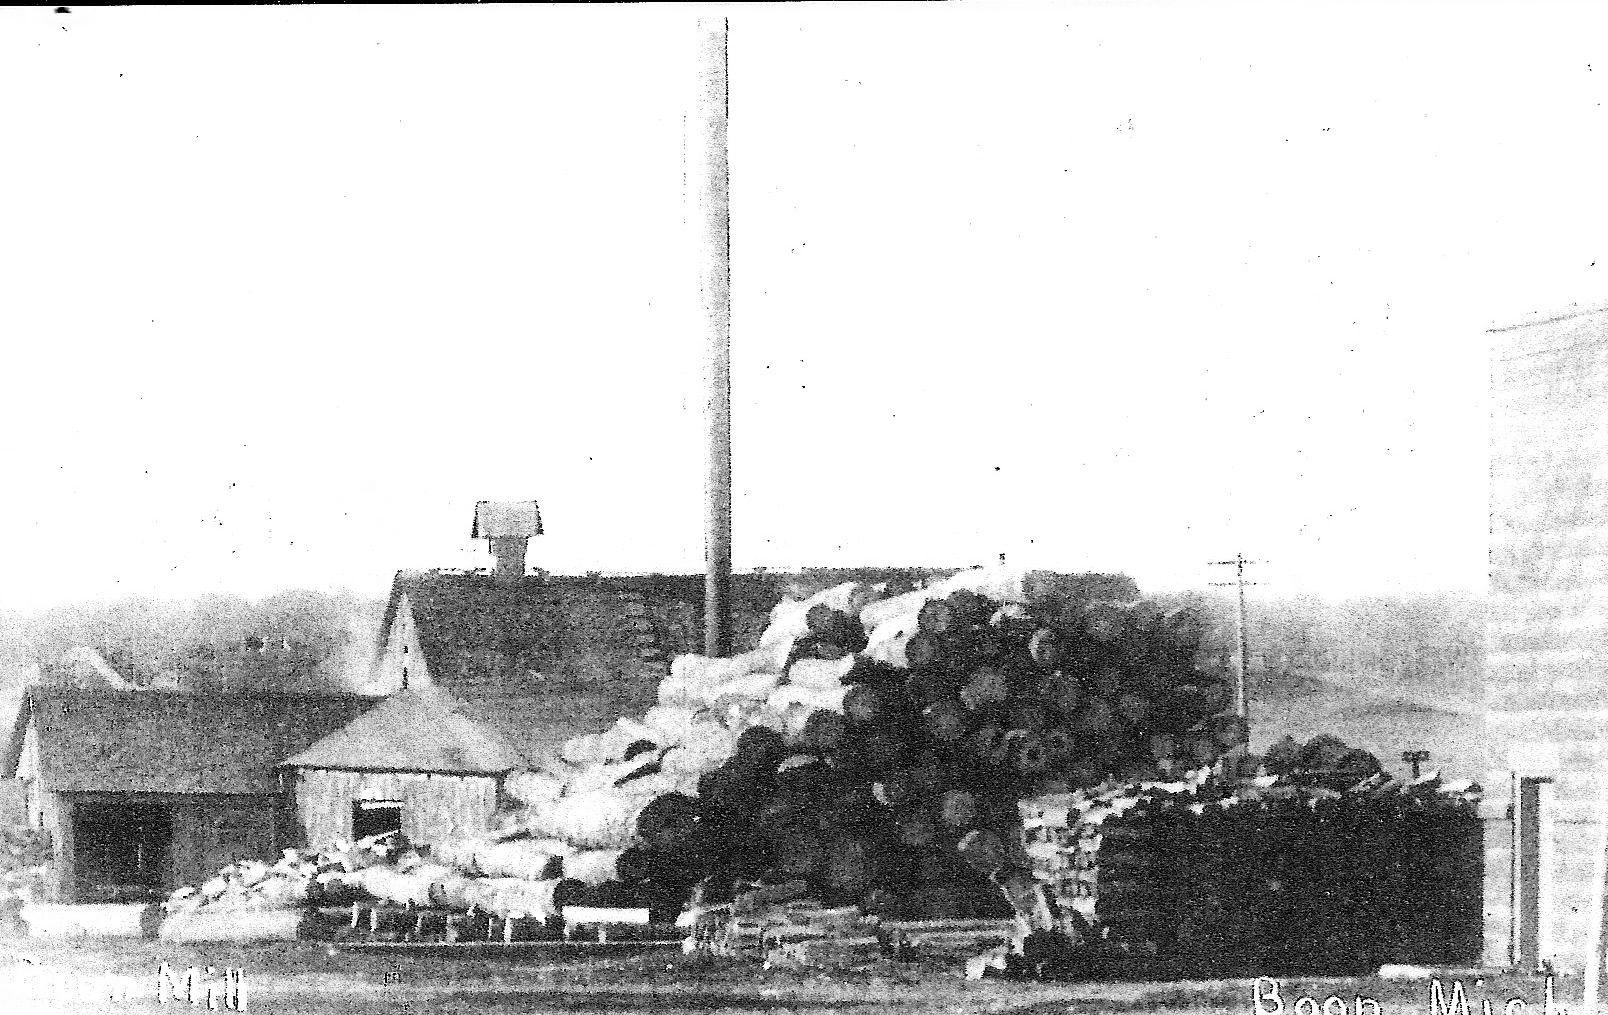 Boon Logging Mill